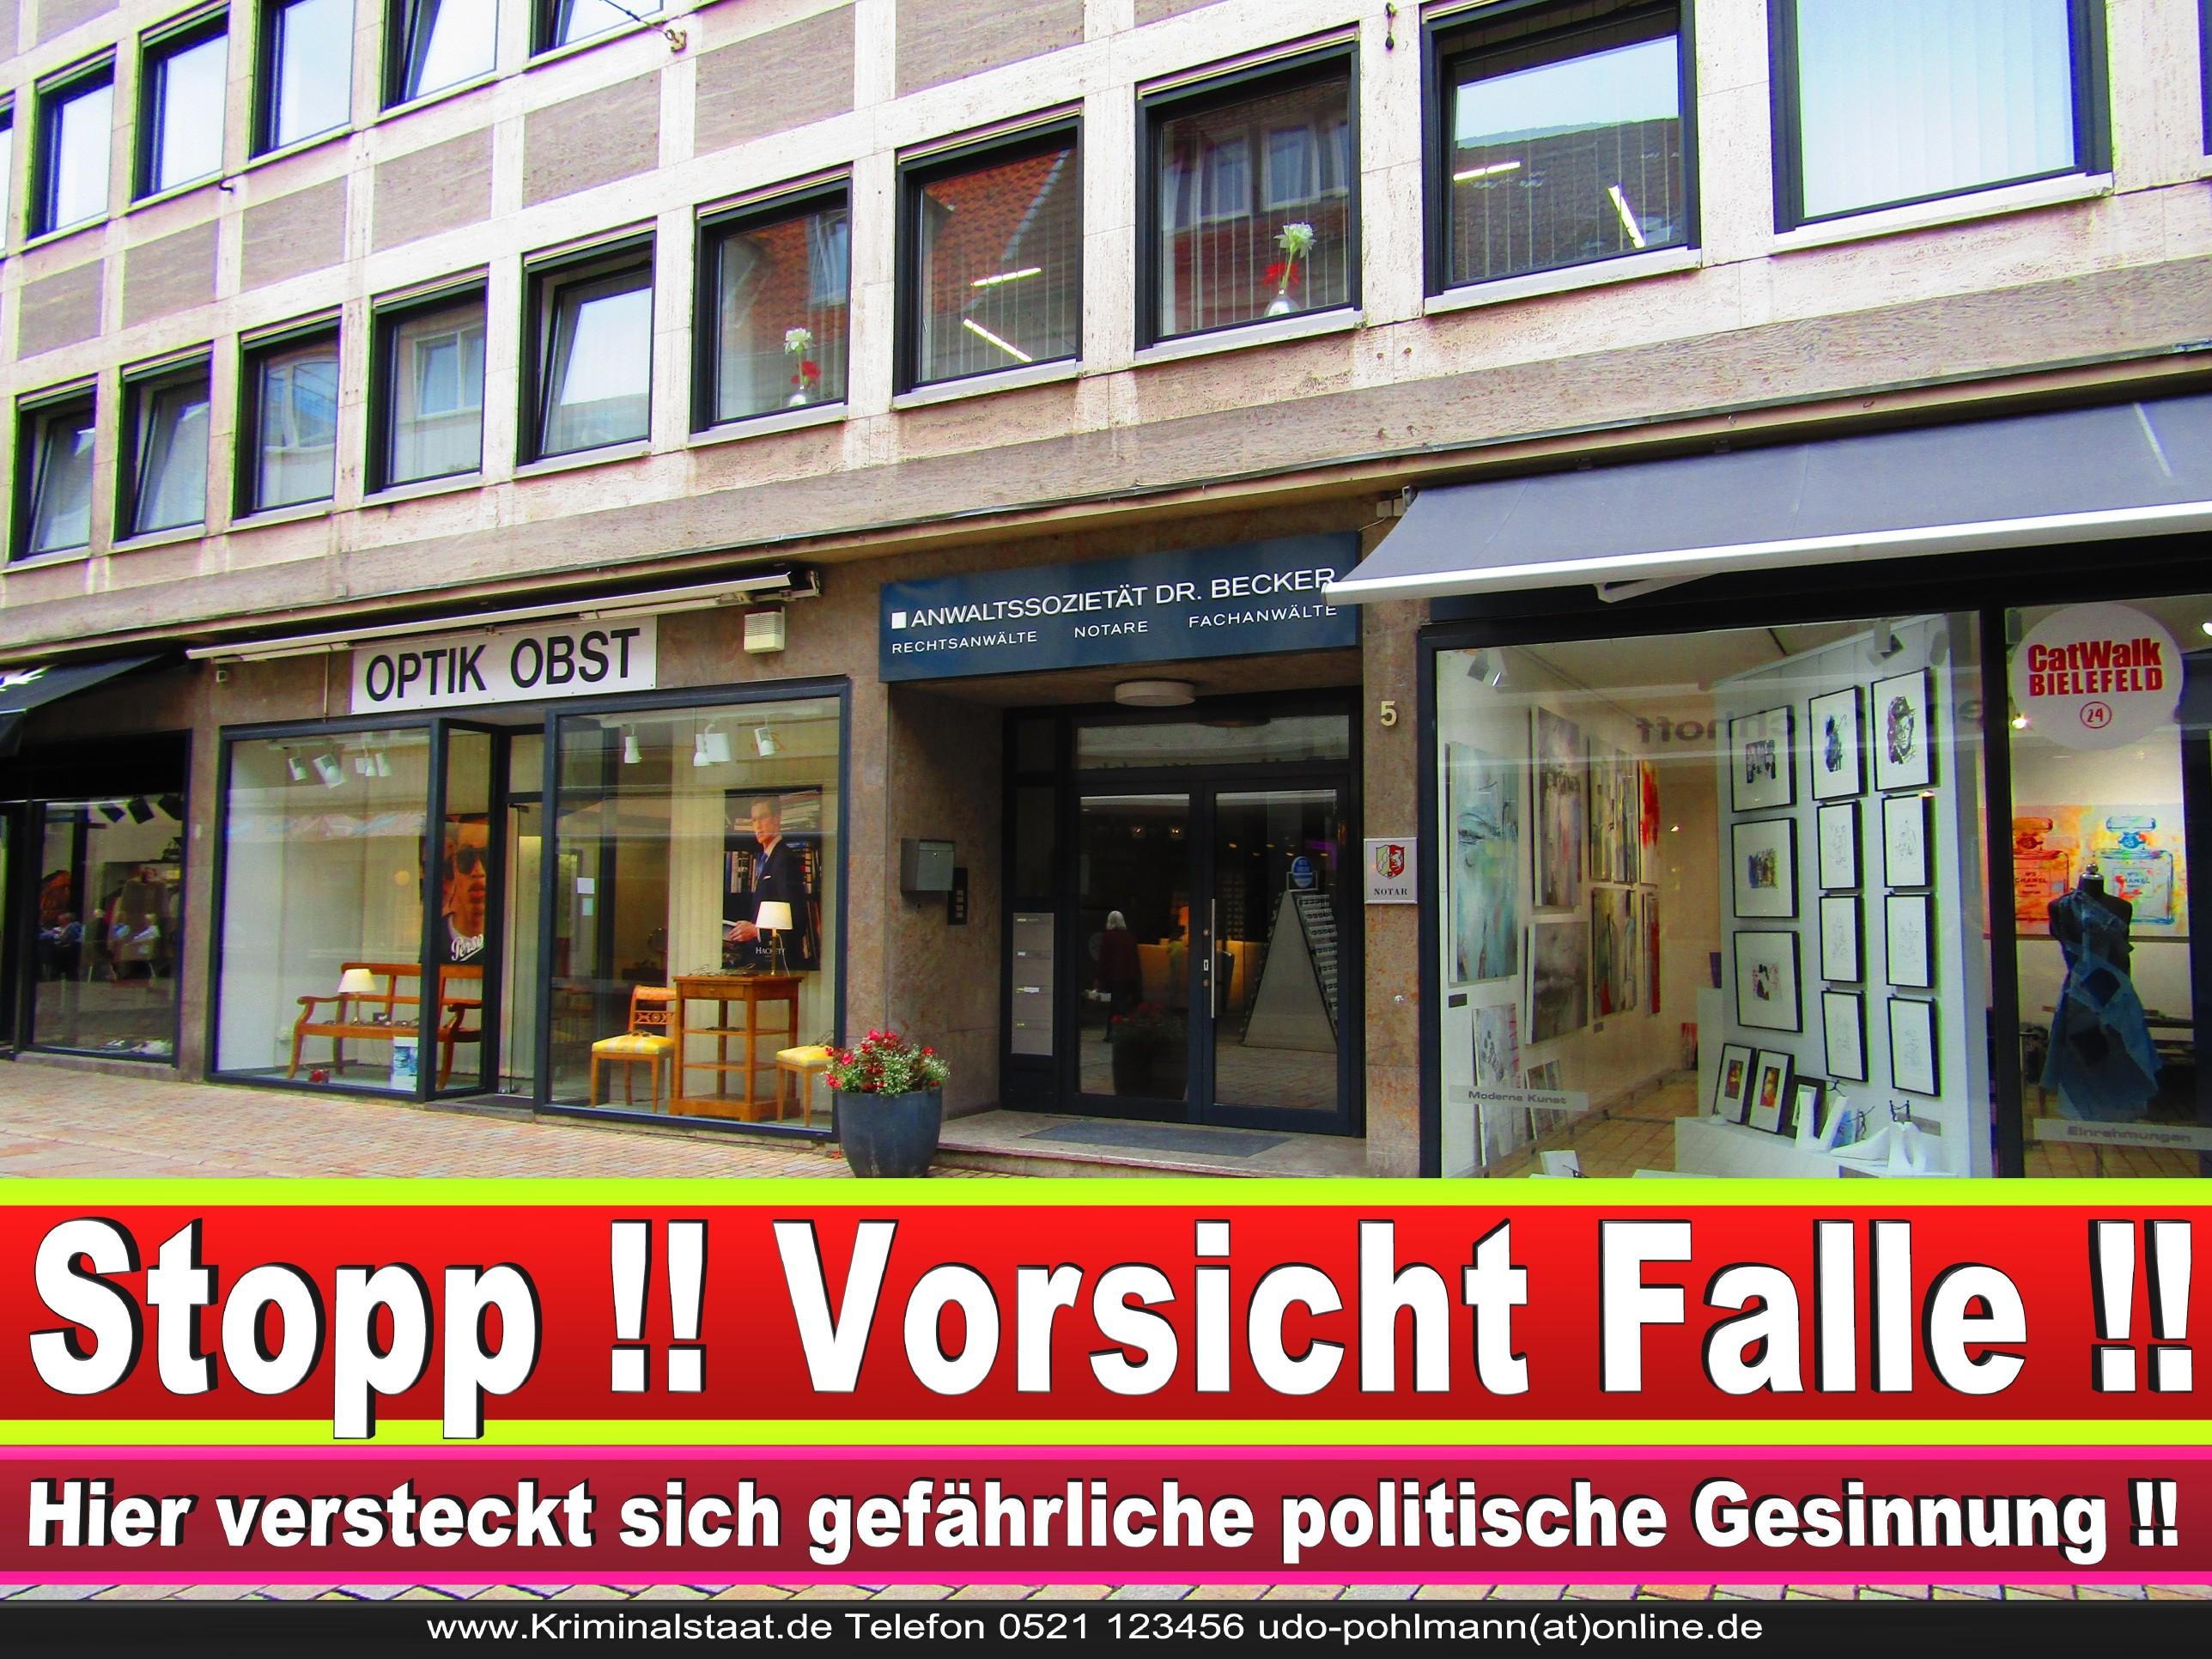 RECHTSANWALT DR THORSTEN FELDMANN CDU BIELEFELD Rechtsanwalt Und Notar A D Werner Kaup 1 LANDTAGSWAHL BUNDESTAGSWAHL BÜRGERMEISTERWAHL